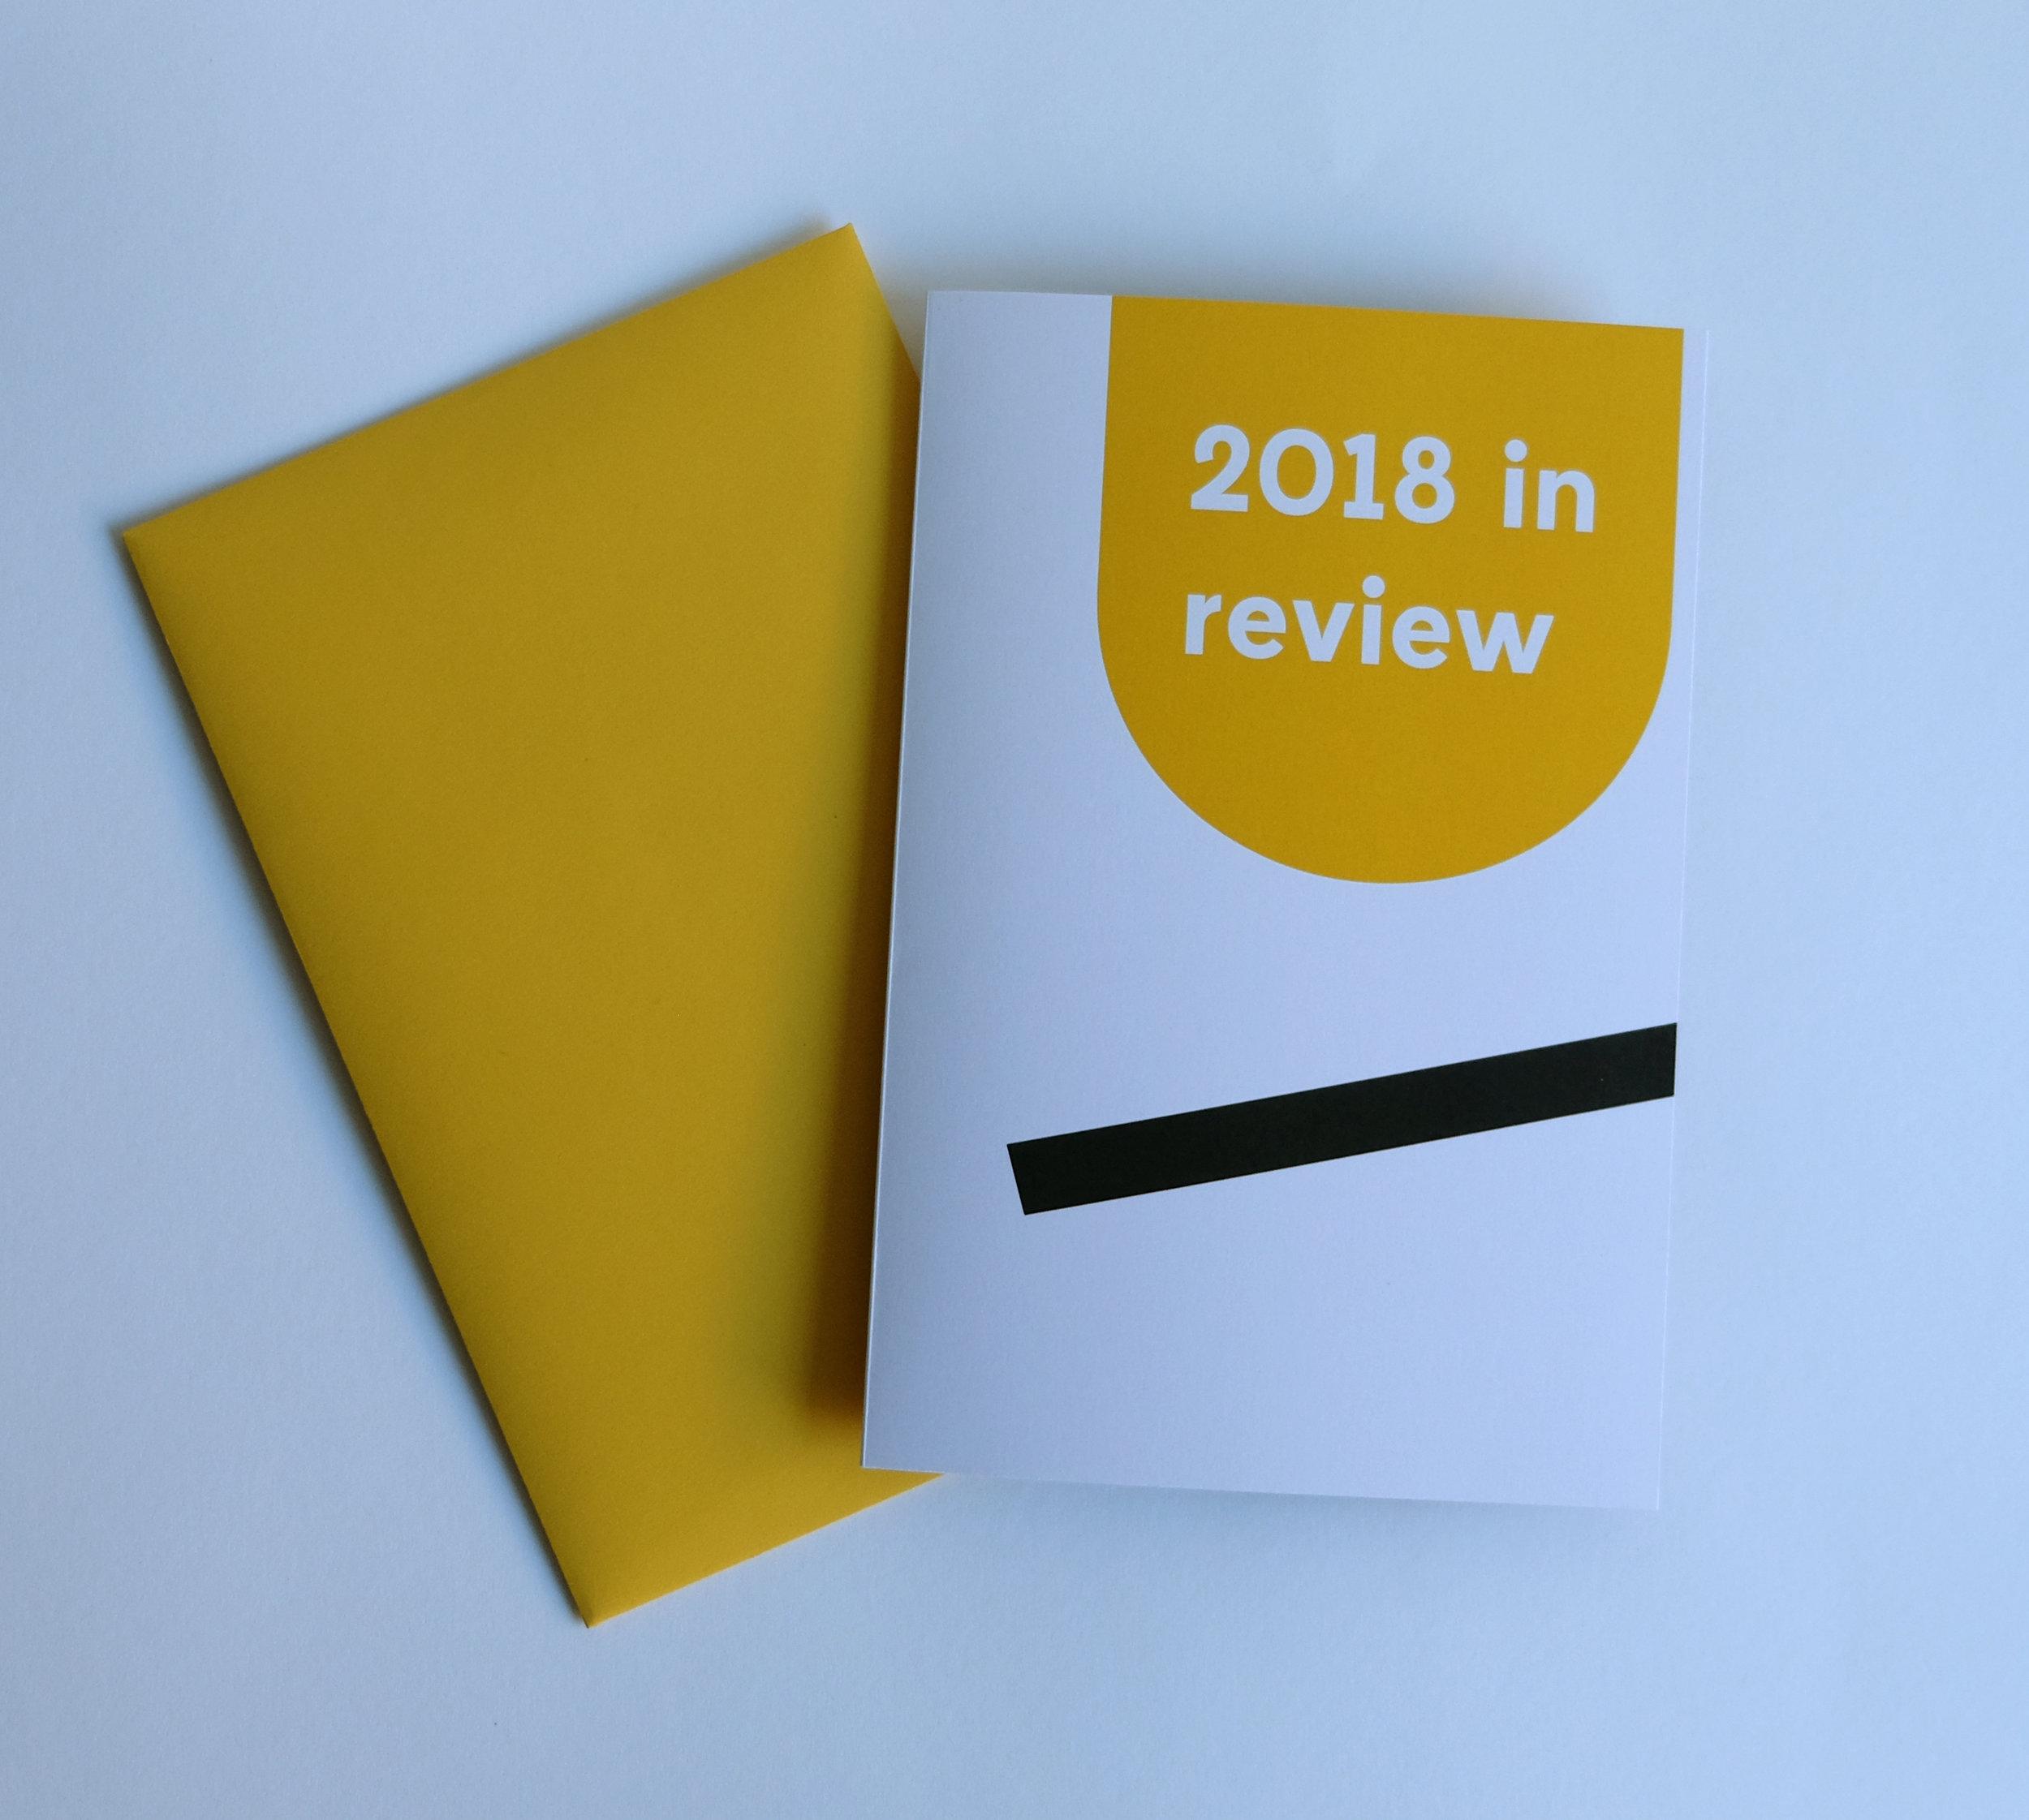 Annual_report_2.jpg